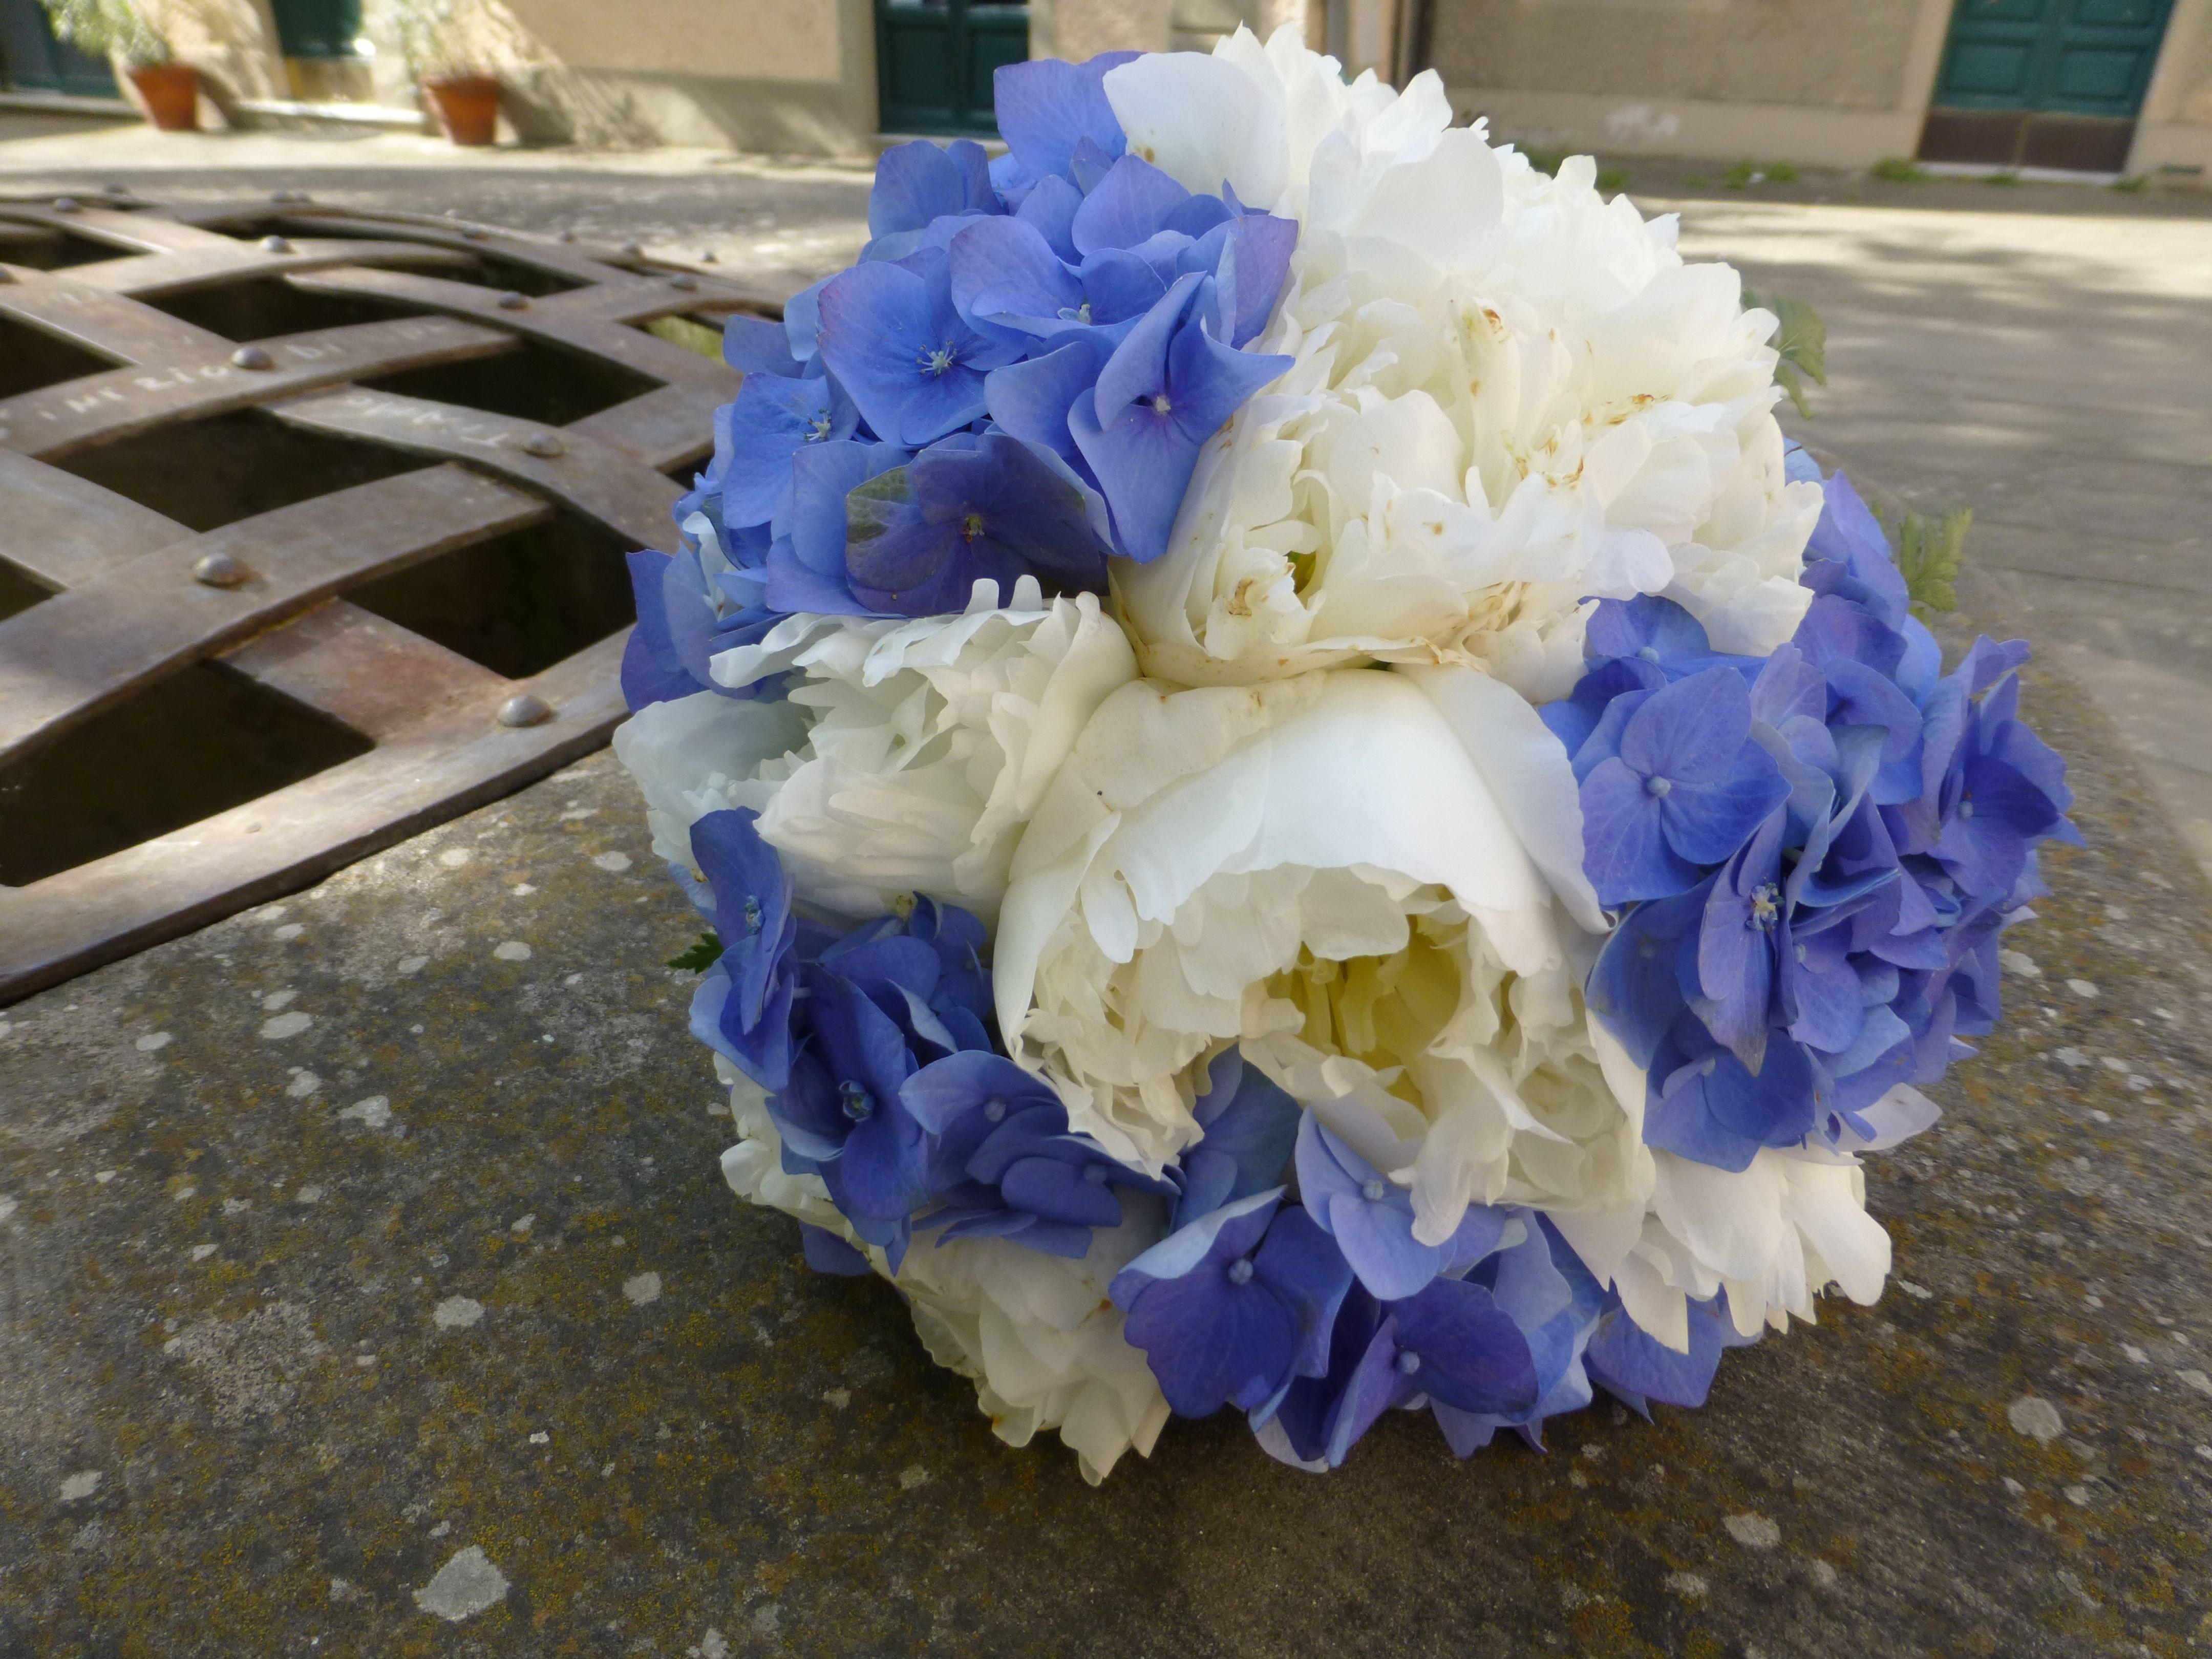 Bouquet Sposa Peonie E Ortensie.Peonia E Ortensia Blu Bouquet Ortensie Matrimonio